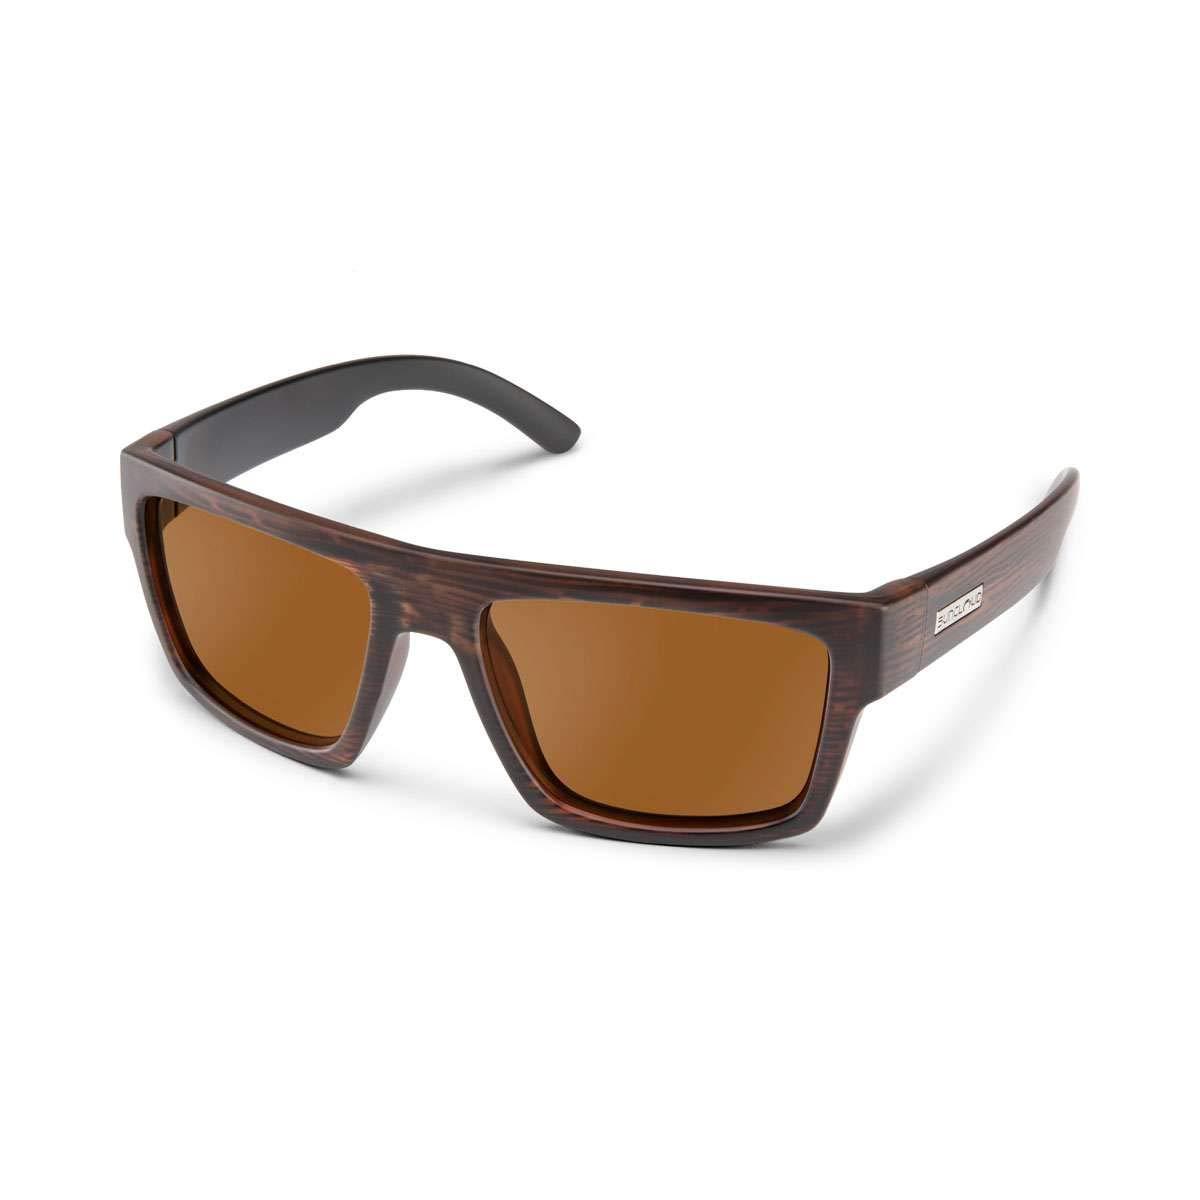 180676d63a Amazon.com  Flatline Polarized Sunglasses  Sports   Outdoors